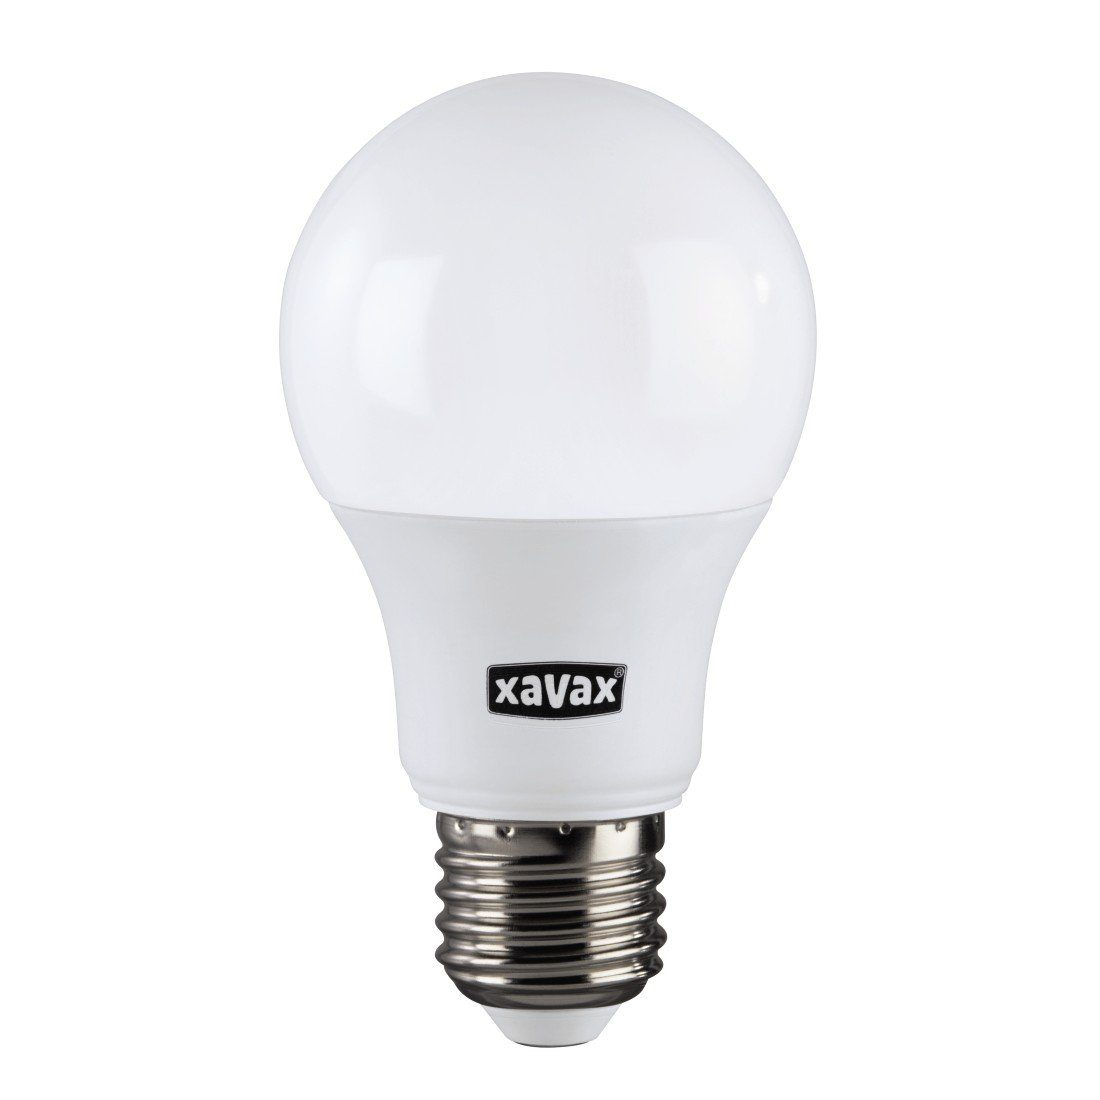 Xavax High Line LED-Lampe, 6,5W, Glühlampenform, E27, Warmweiß, RA90